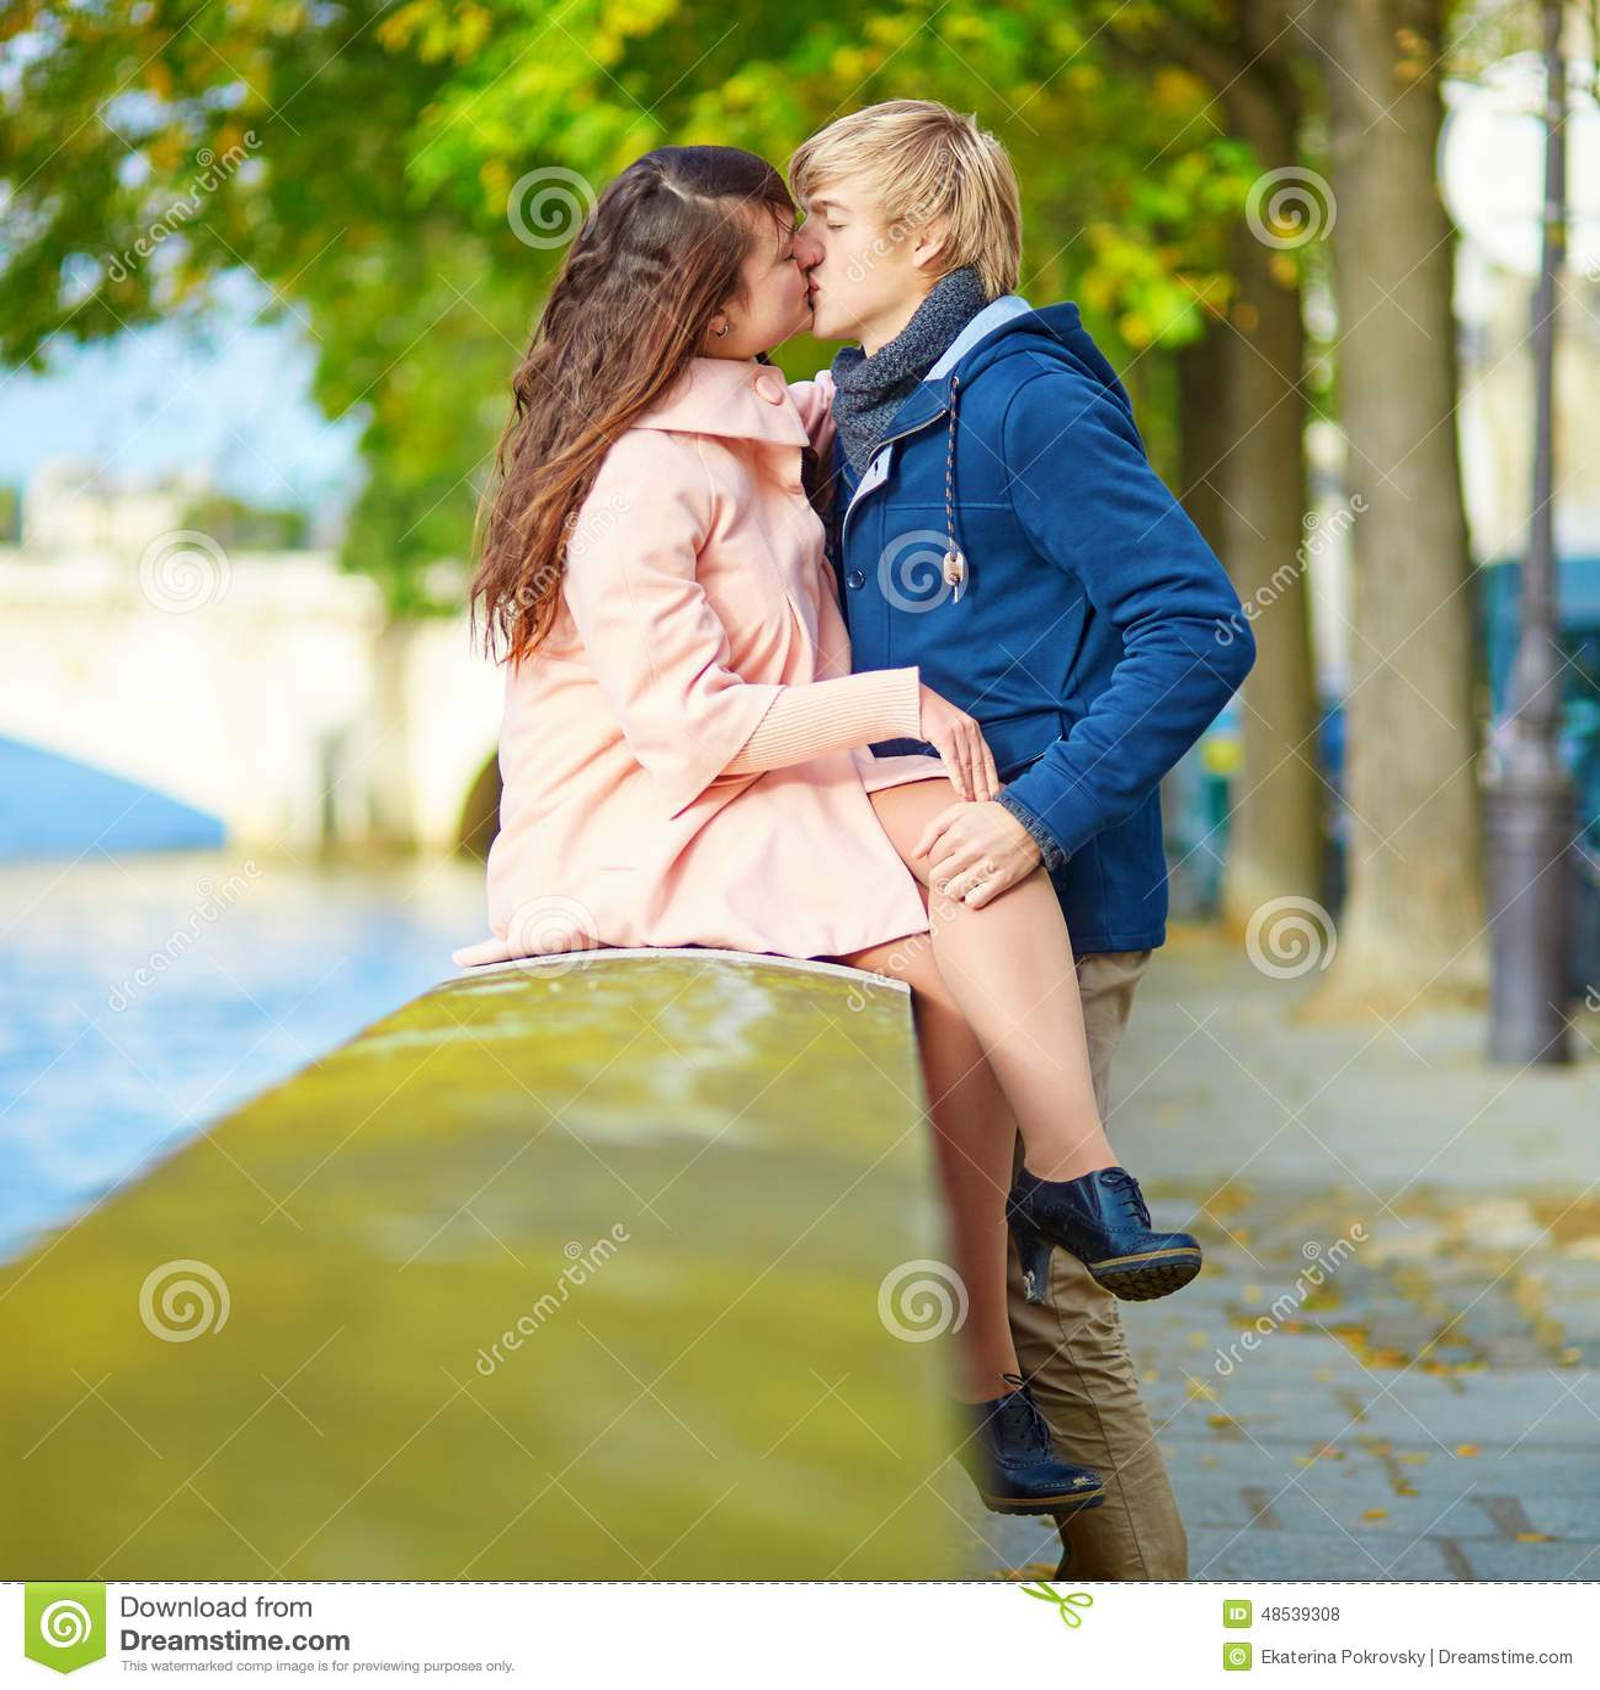 Paris dating online